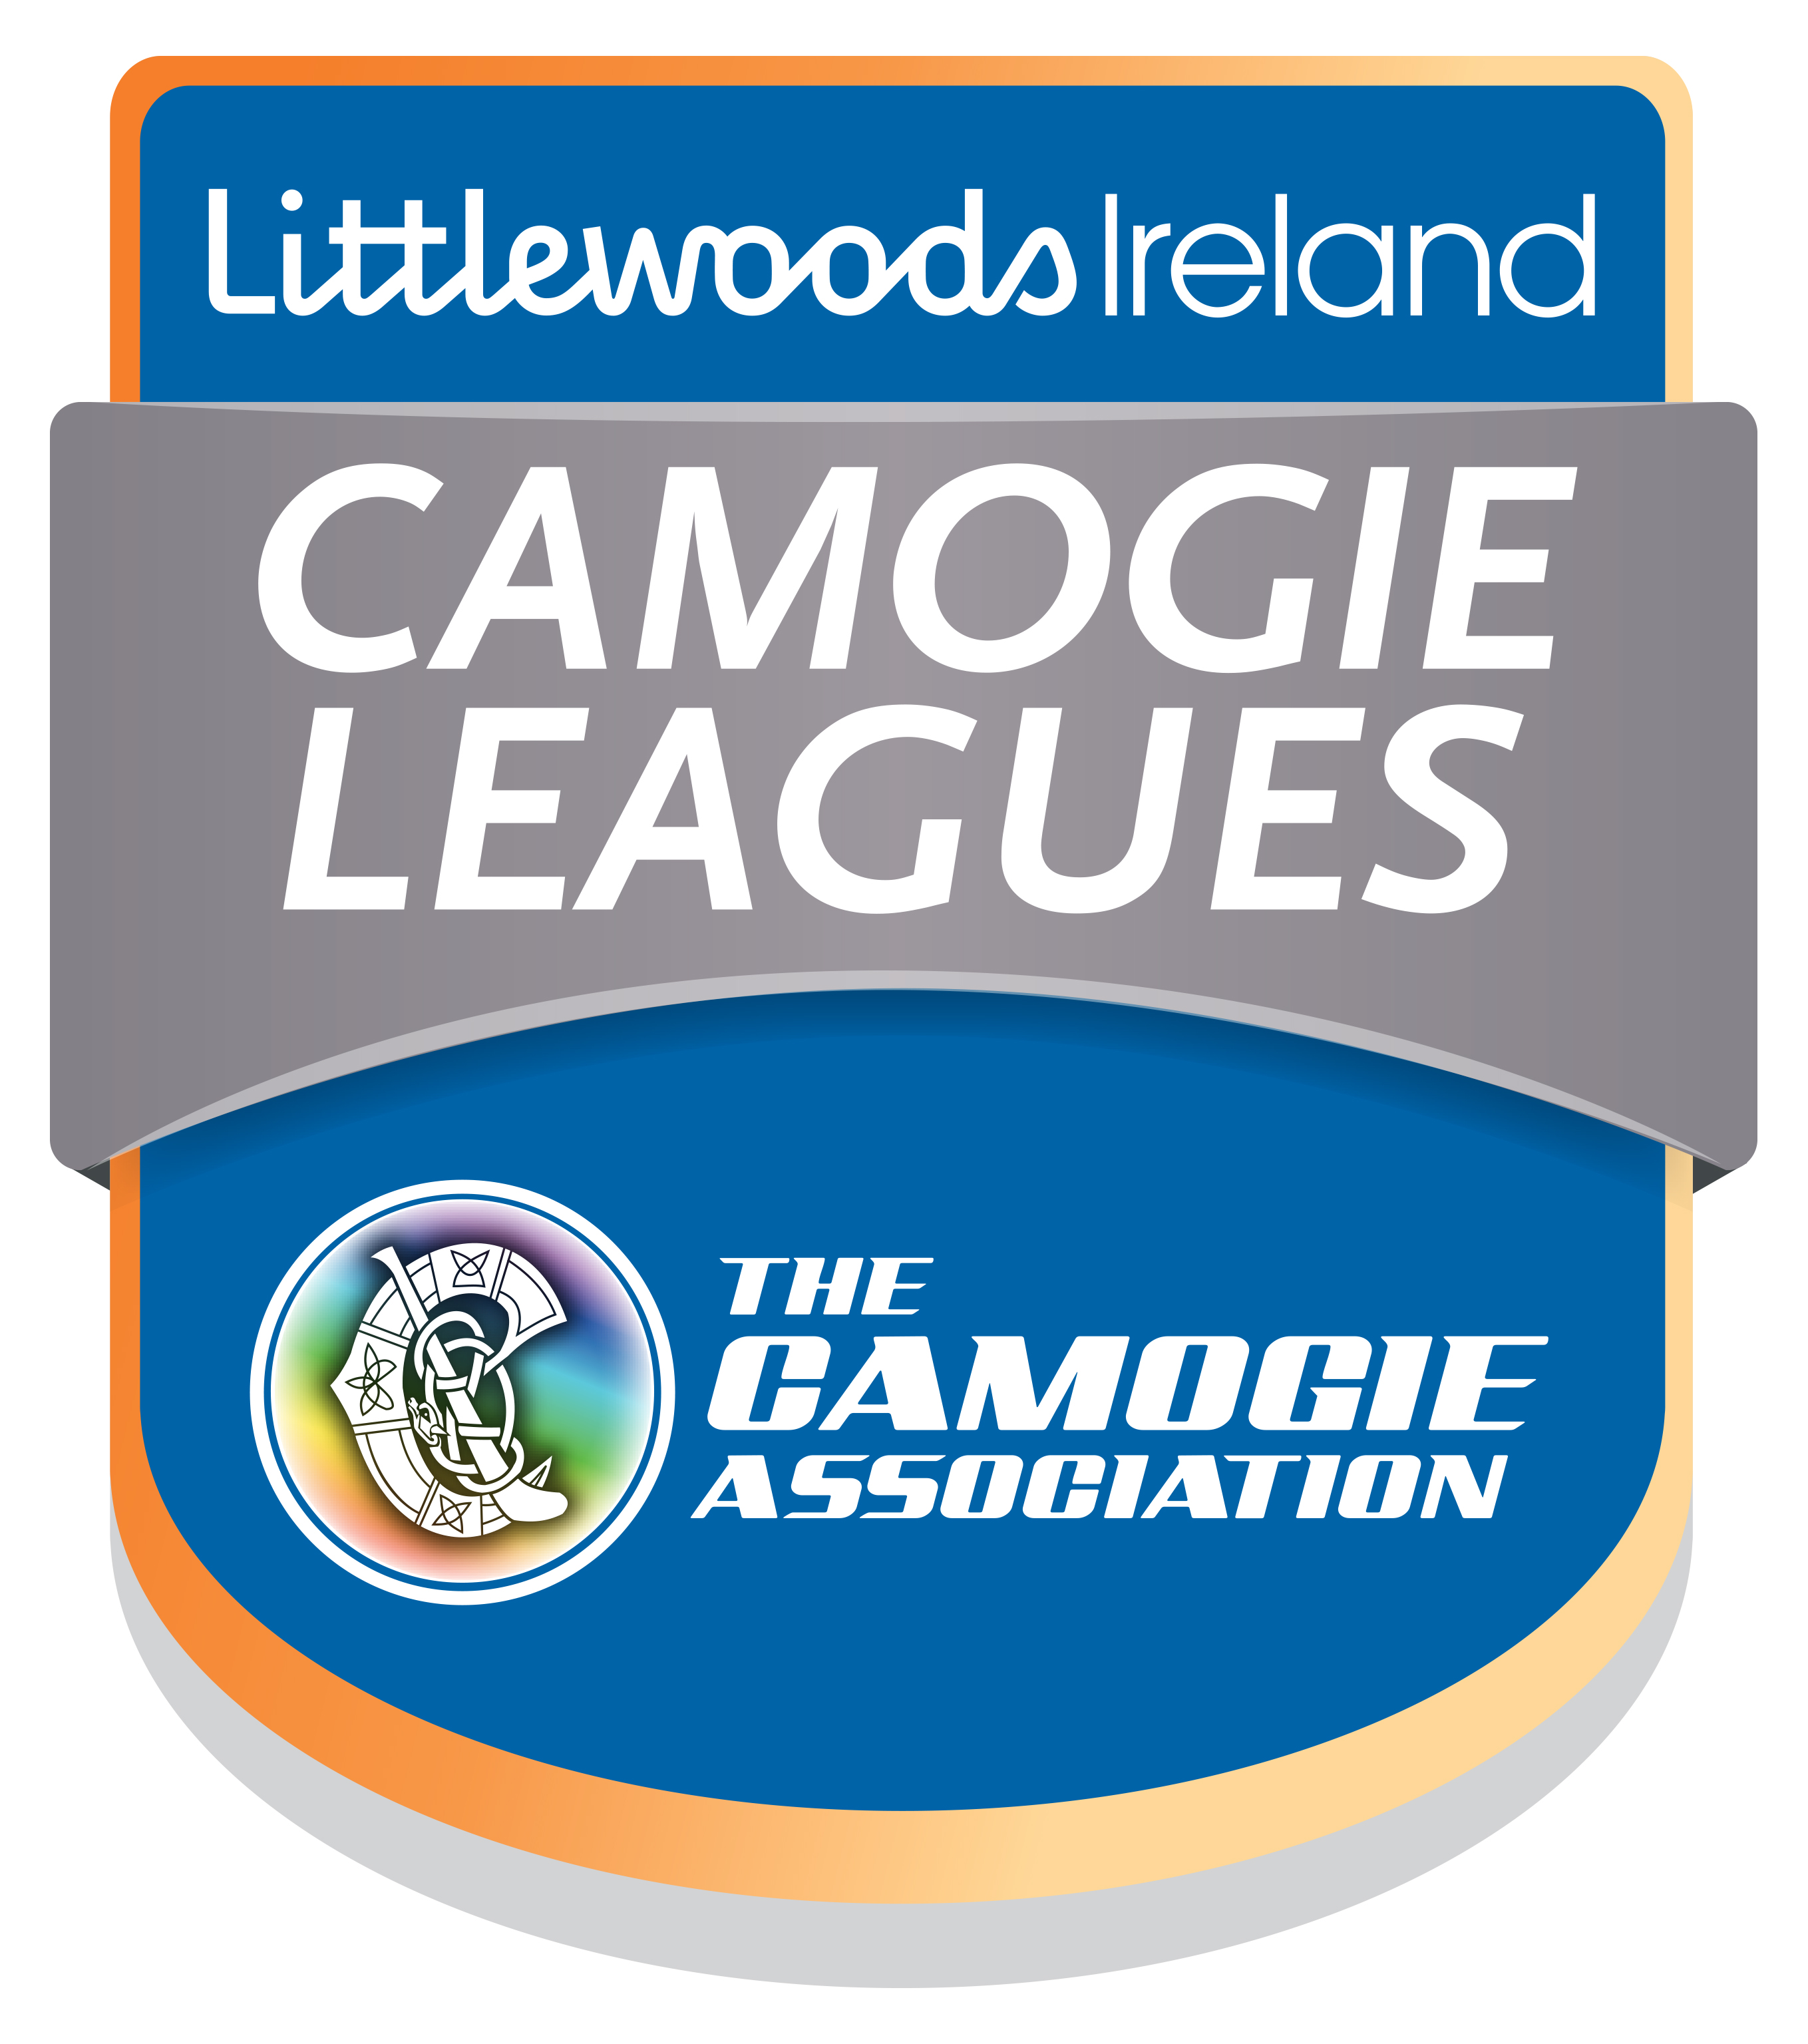 CamogieLeagues_LogoFinal